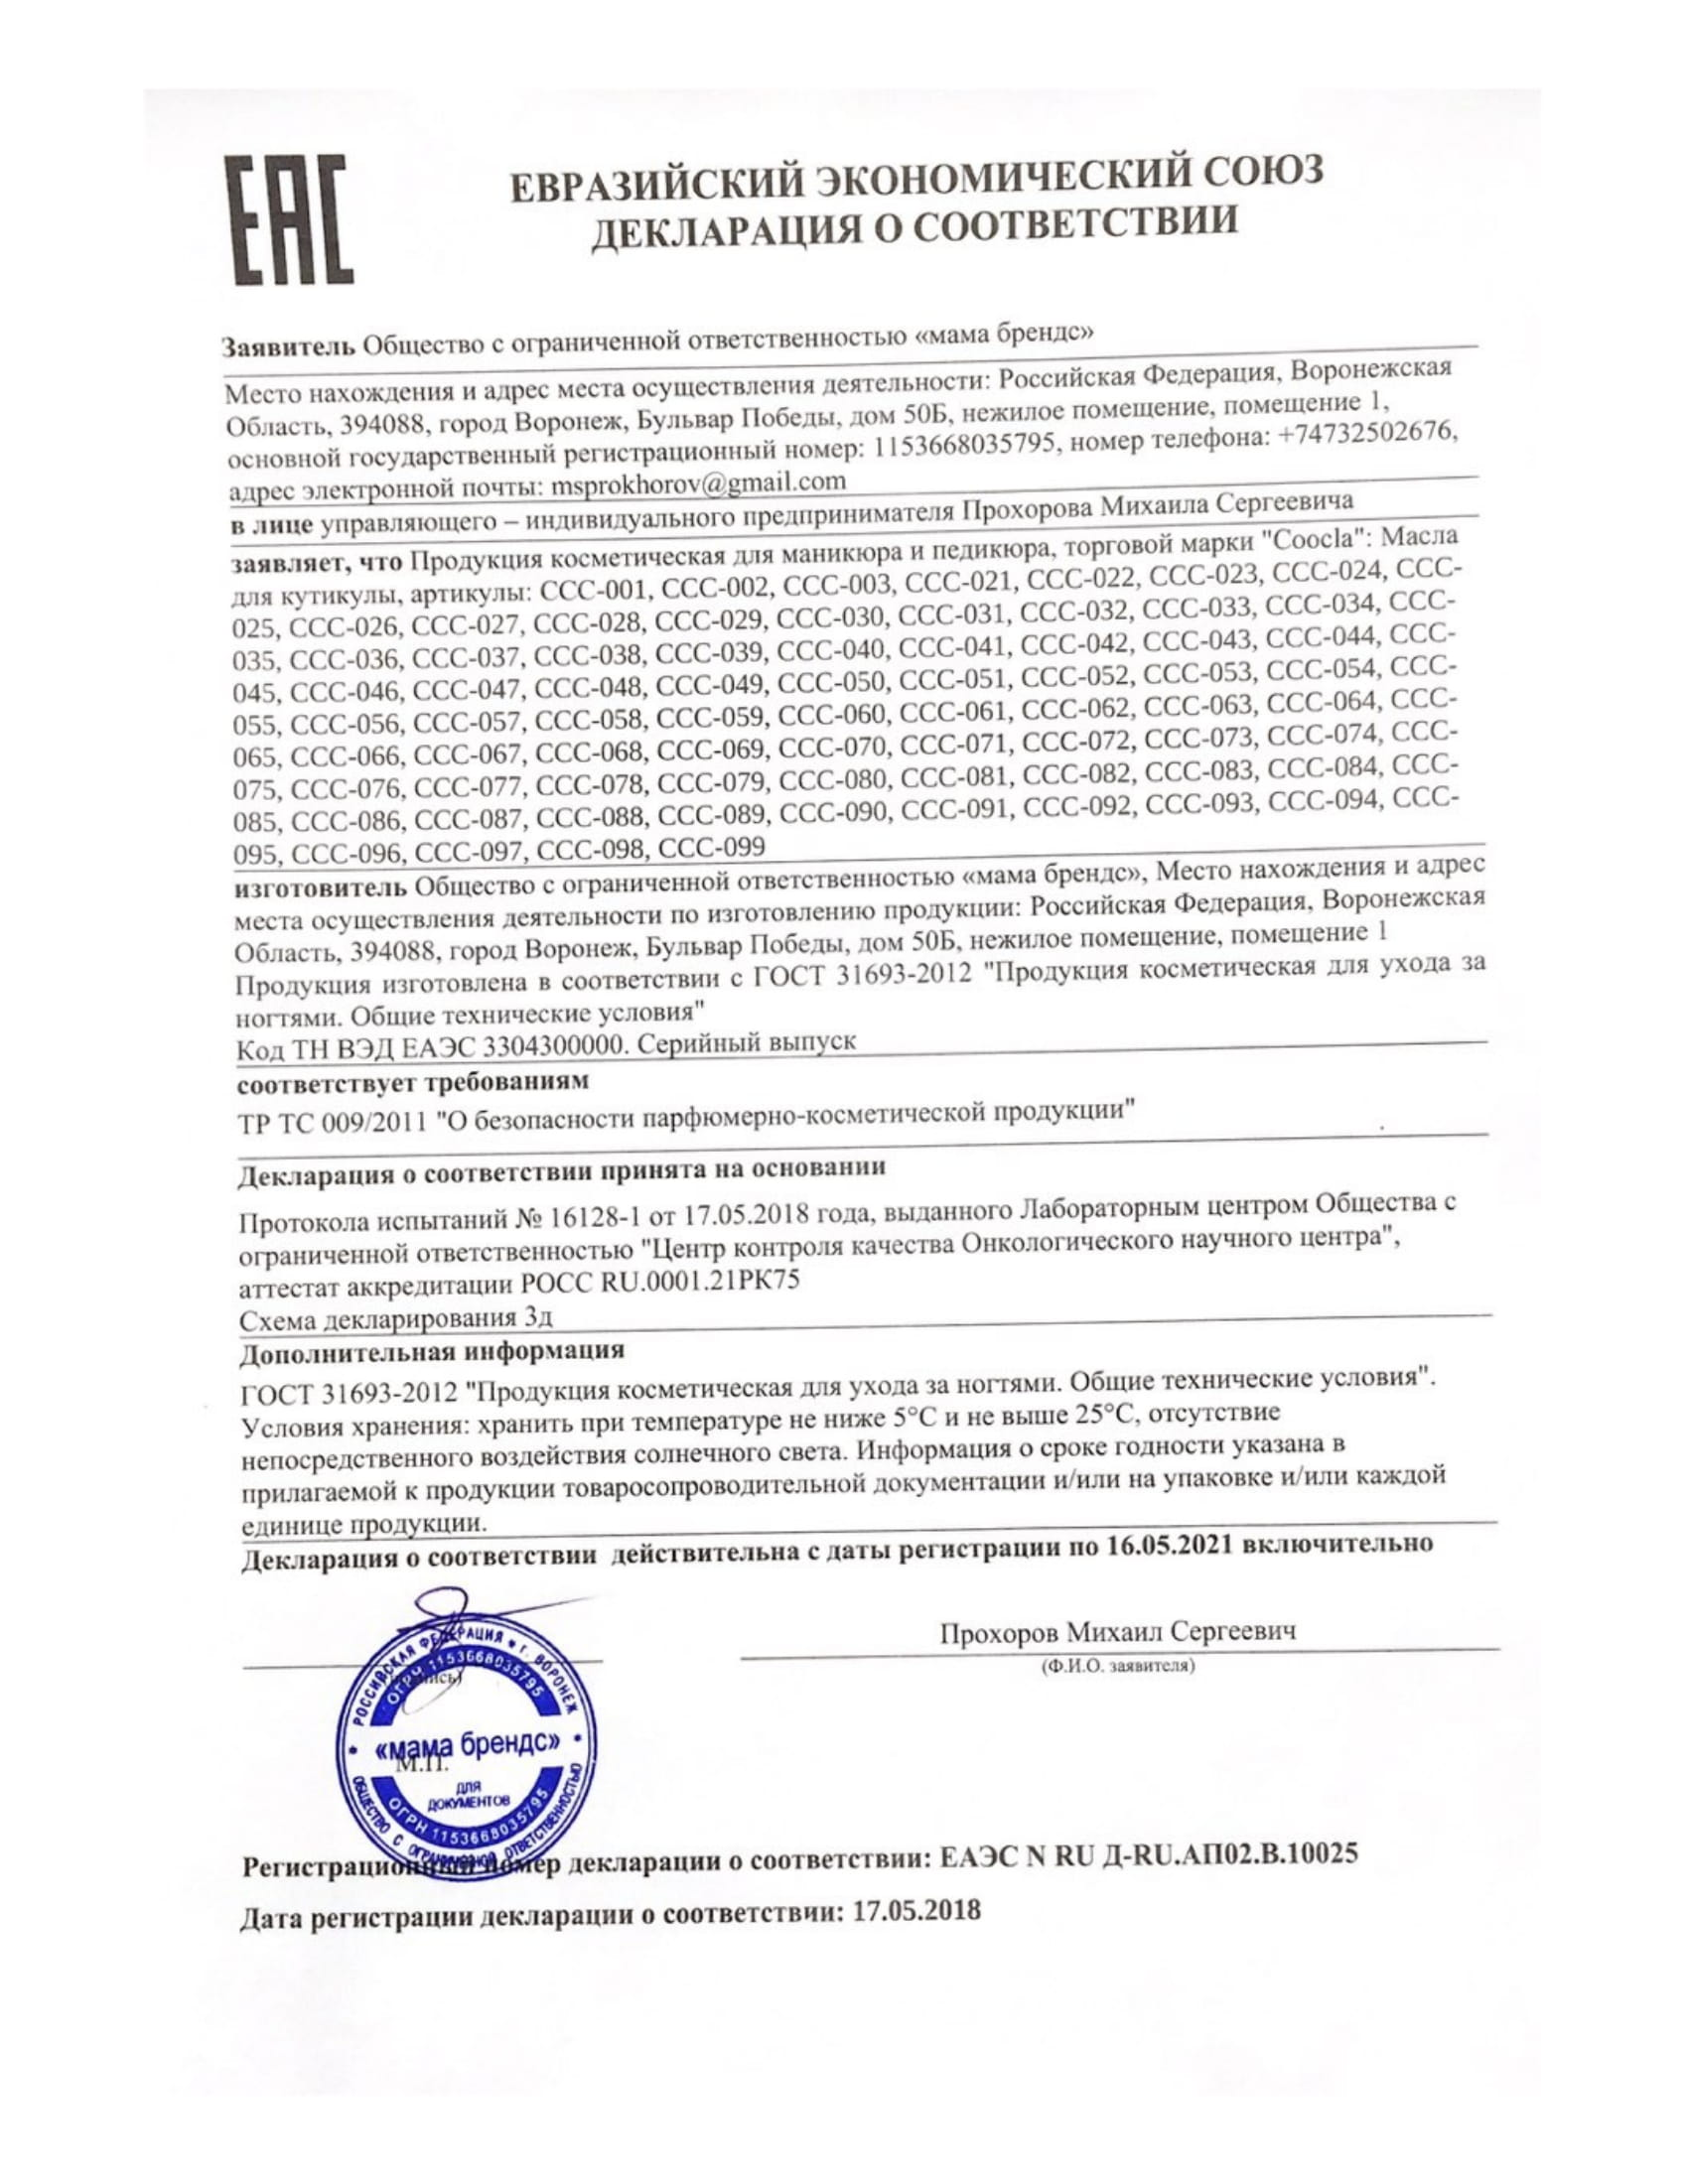 ЕАЭС N RU Д-RU.АП02.В.10025-1